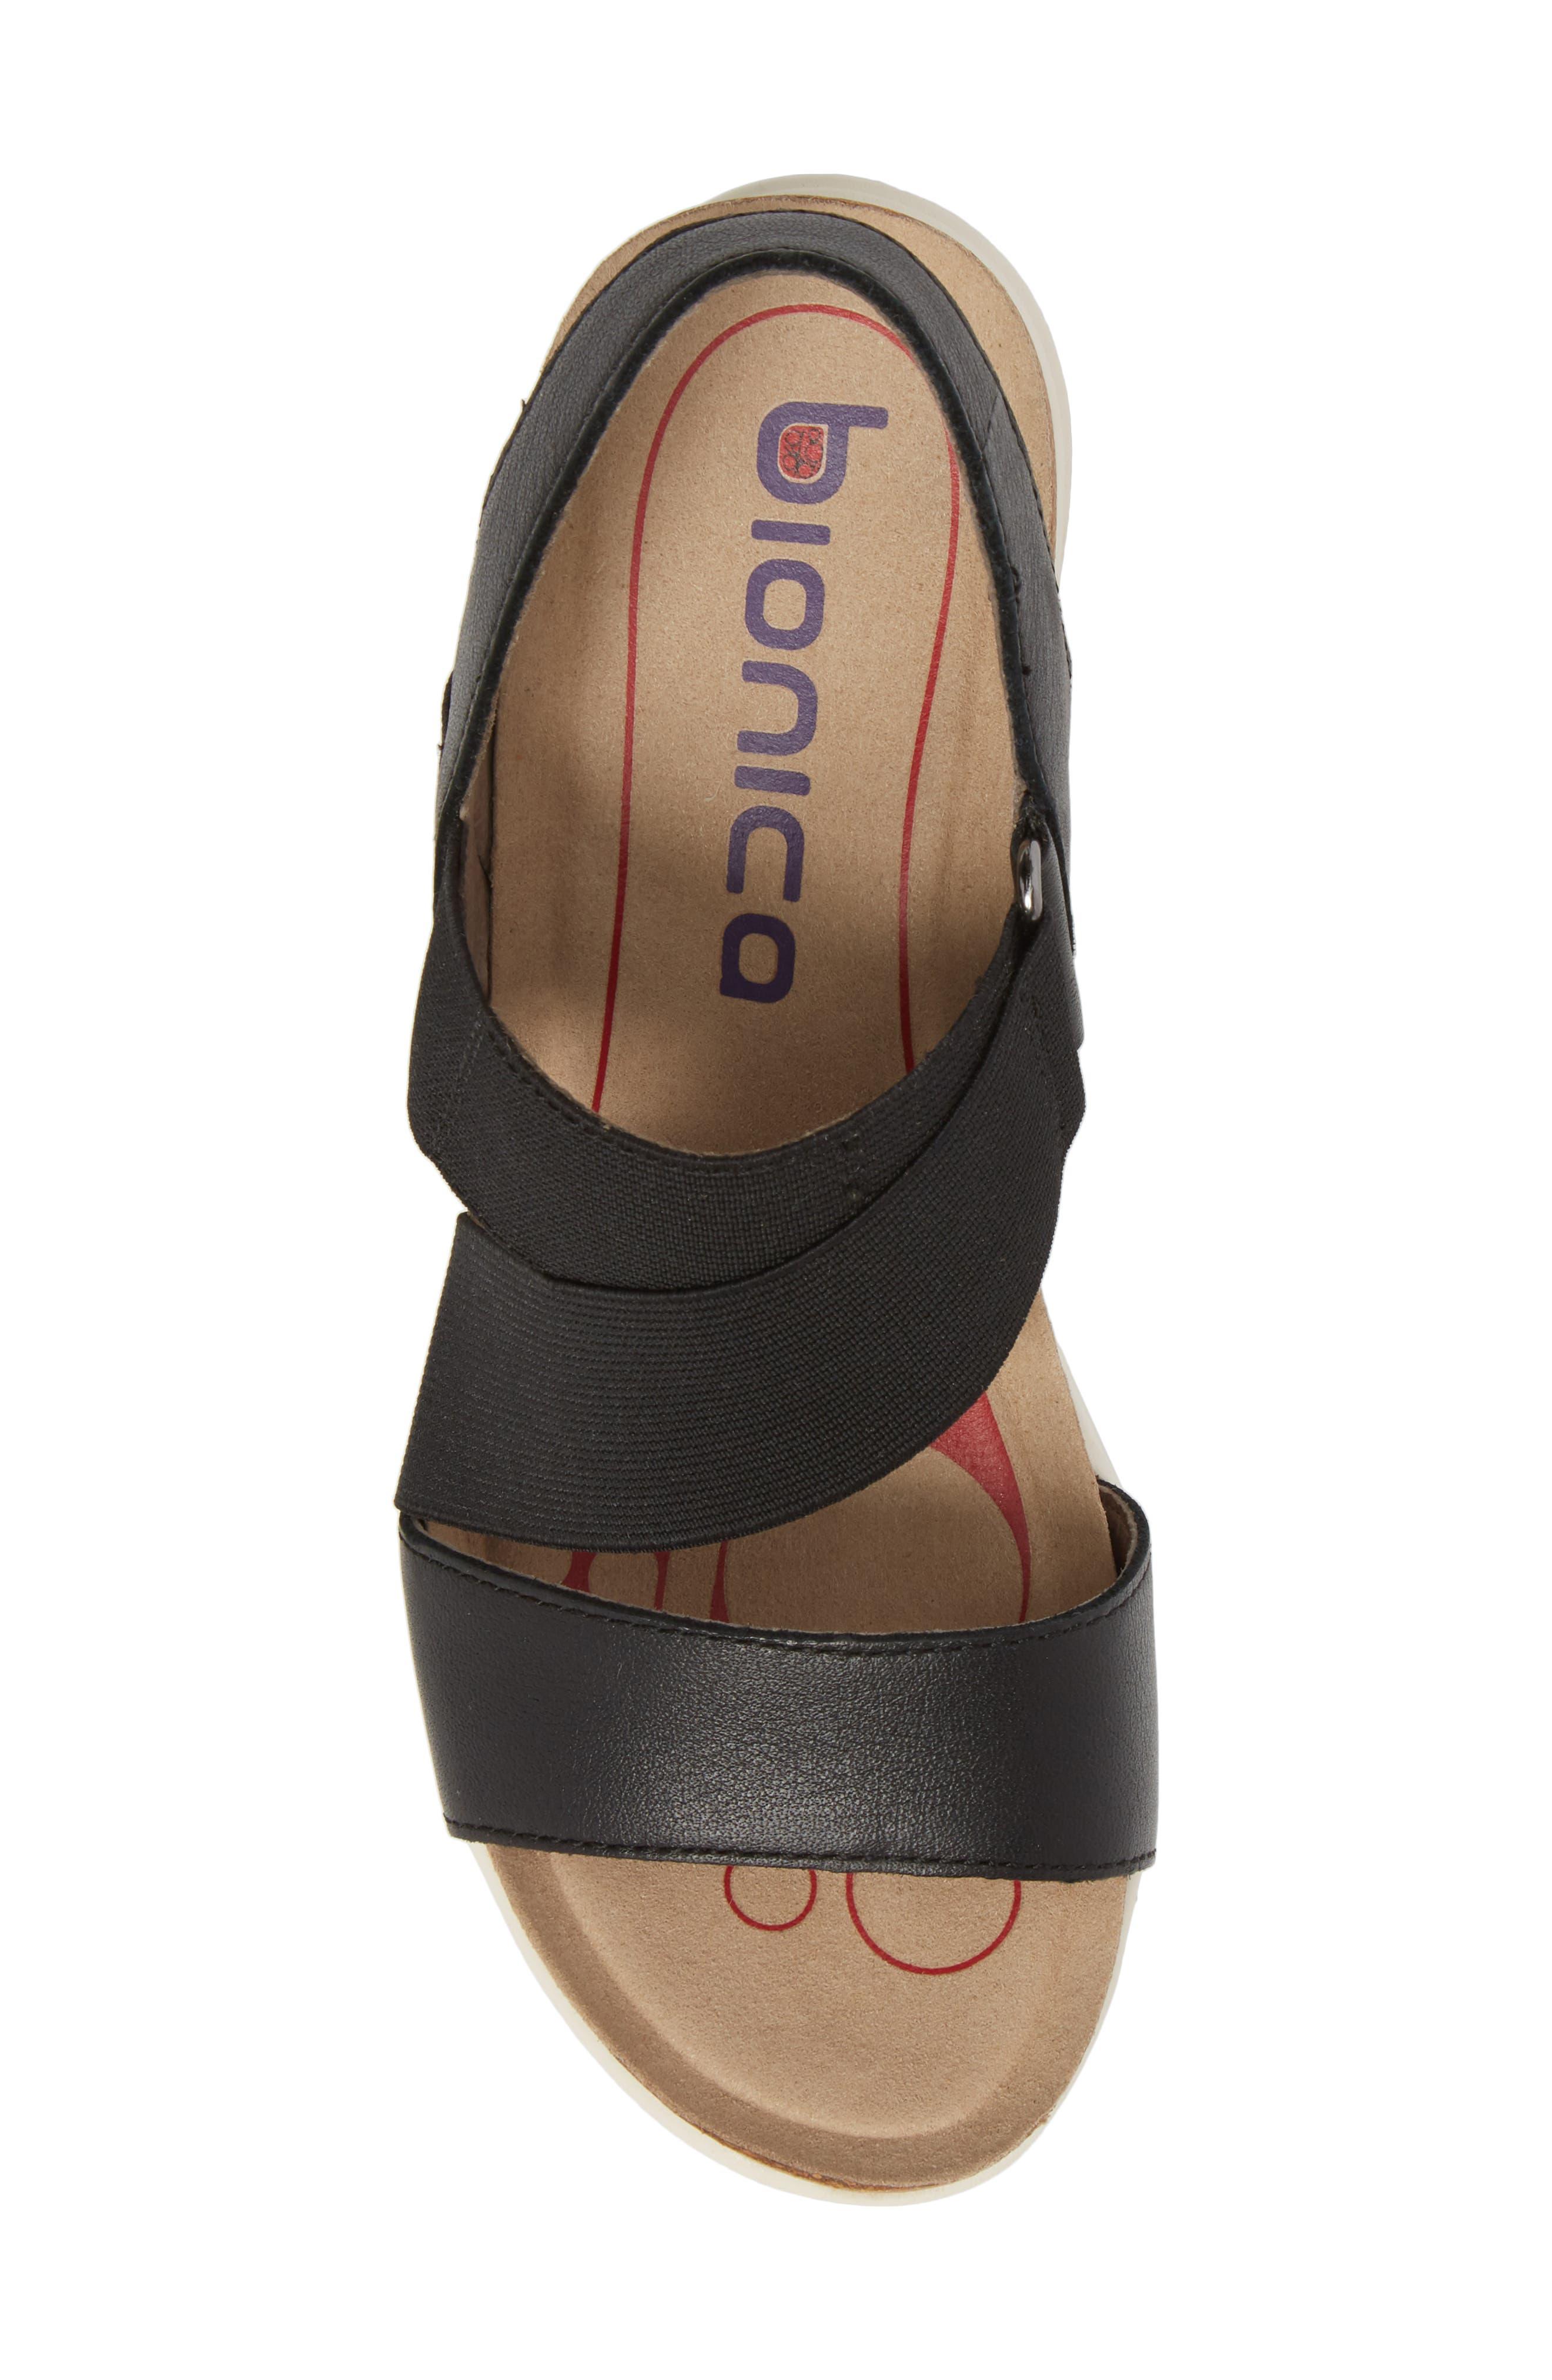 Paisley Wedge Sandal,                             Alternate thumbnail 5, color,                             001